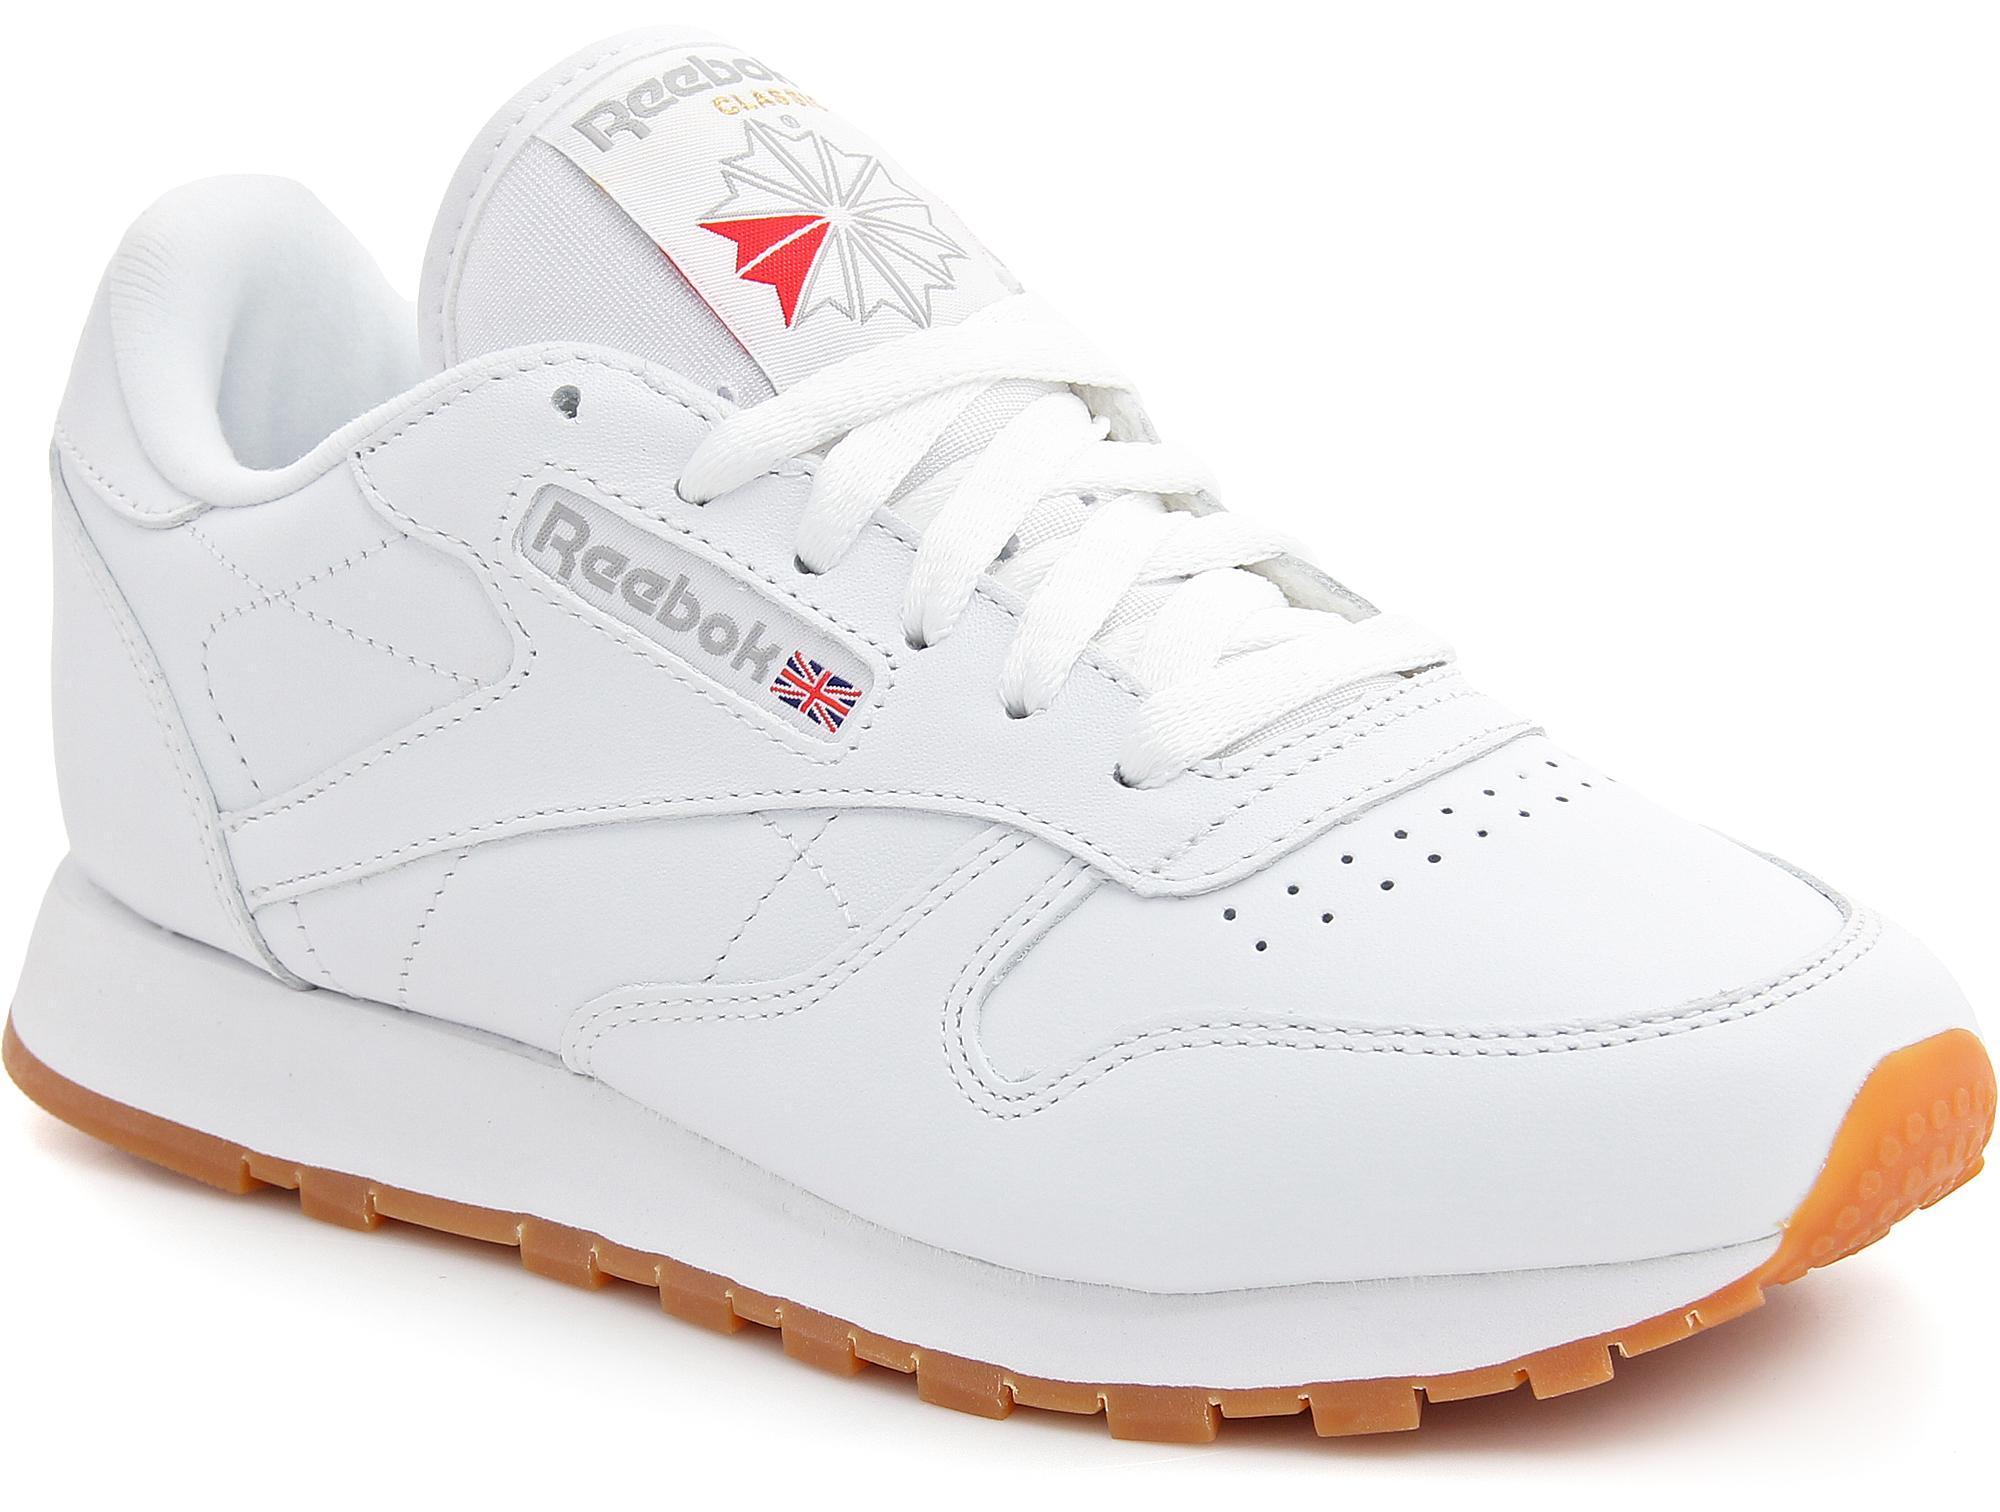 Купить со скидкой Кроссовки Reebok Classic Leather 49803 White